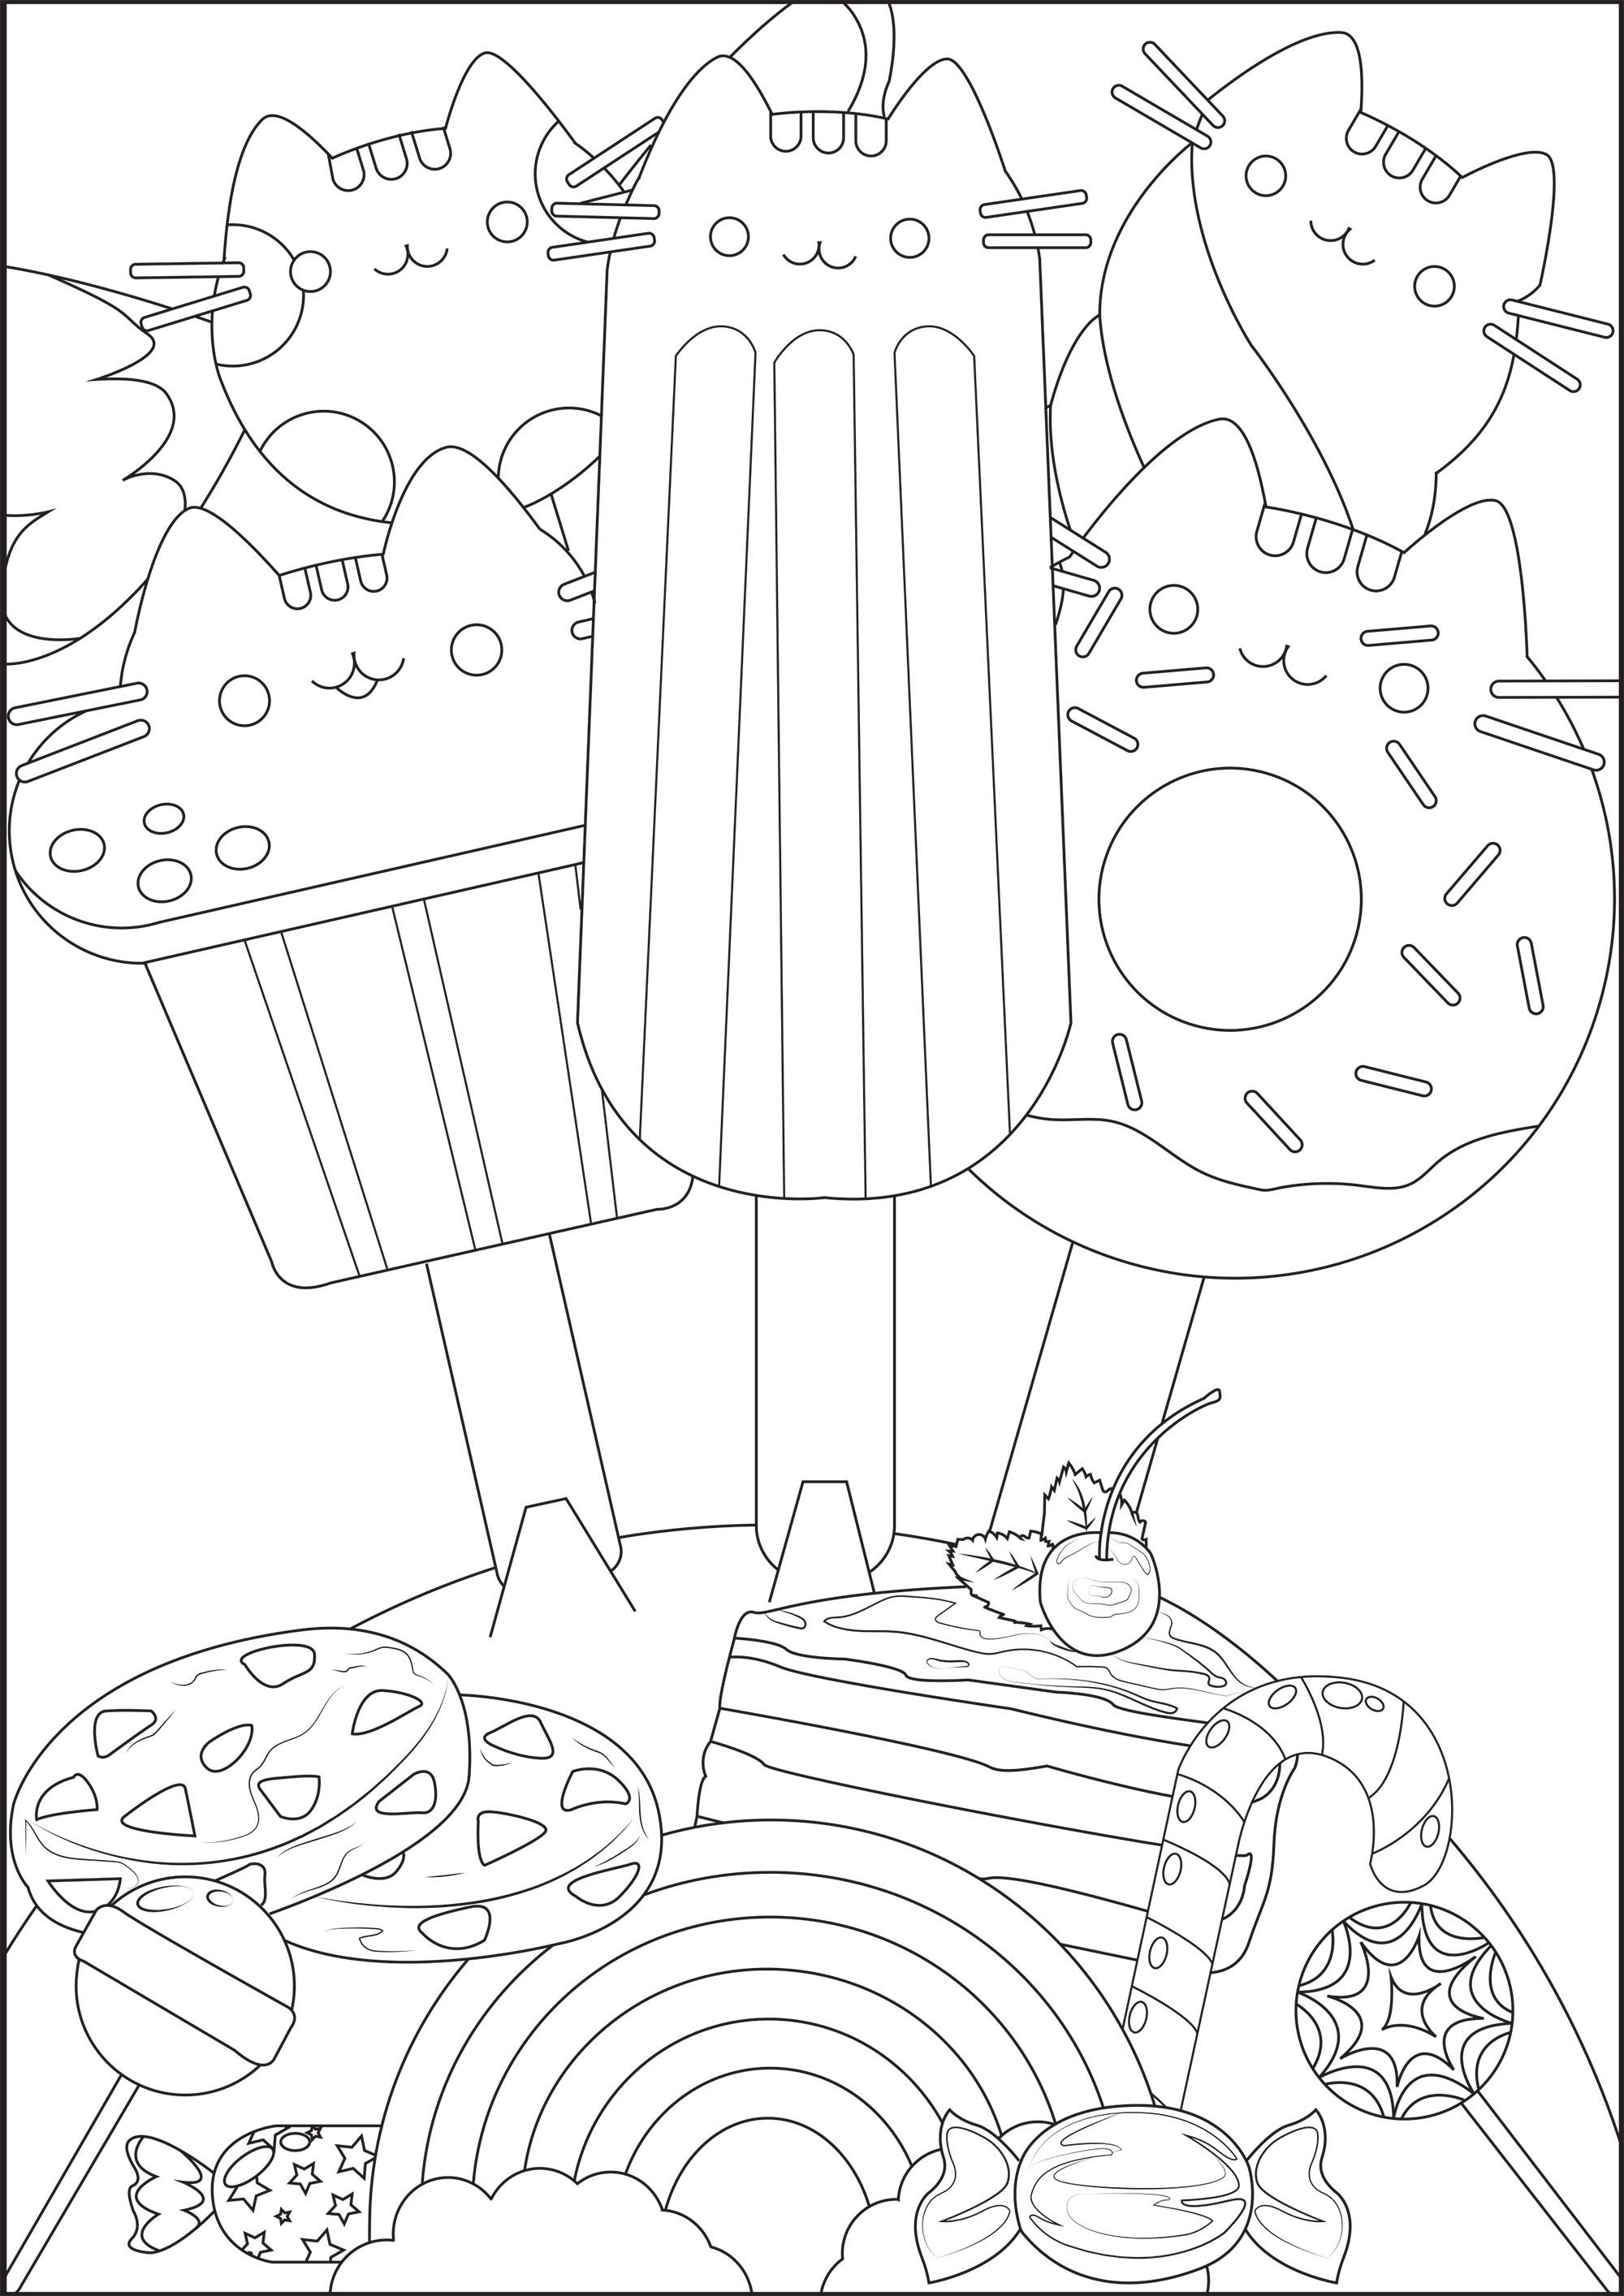 Disegni da Colorare per Adulti : Doodle art / Doodling - 2